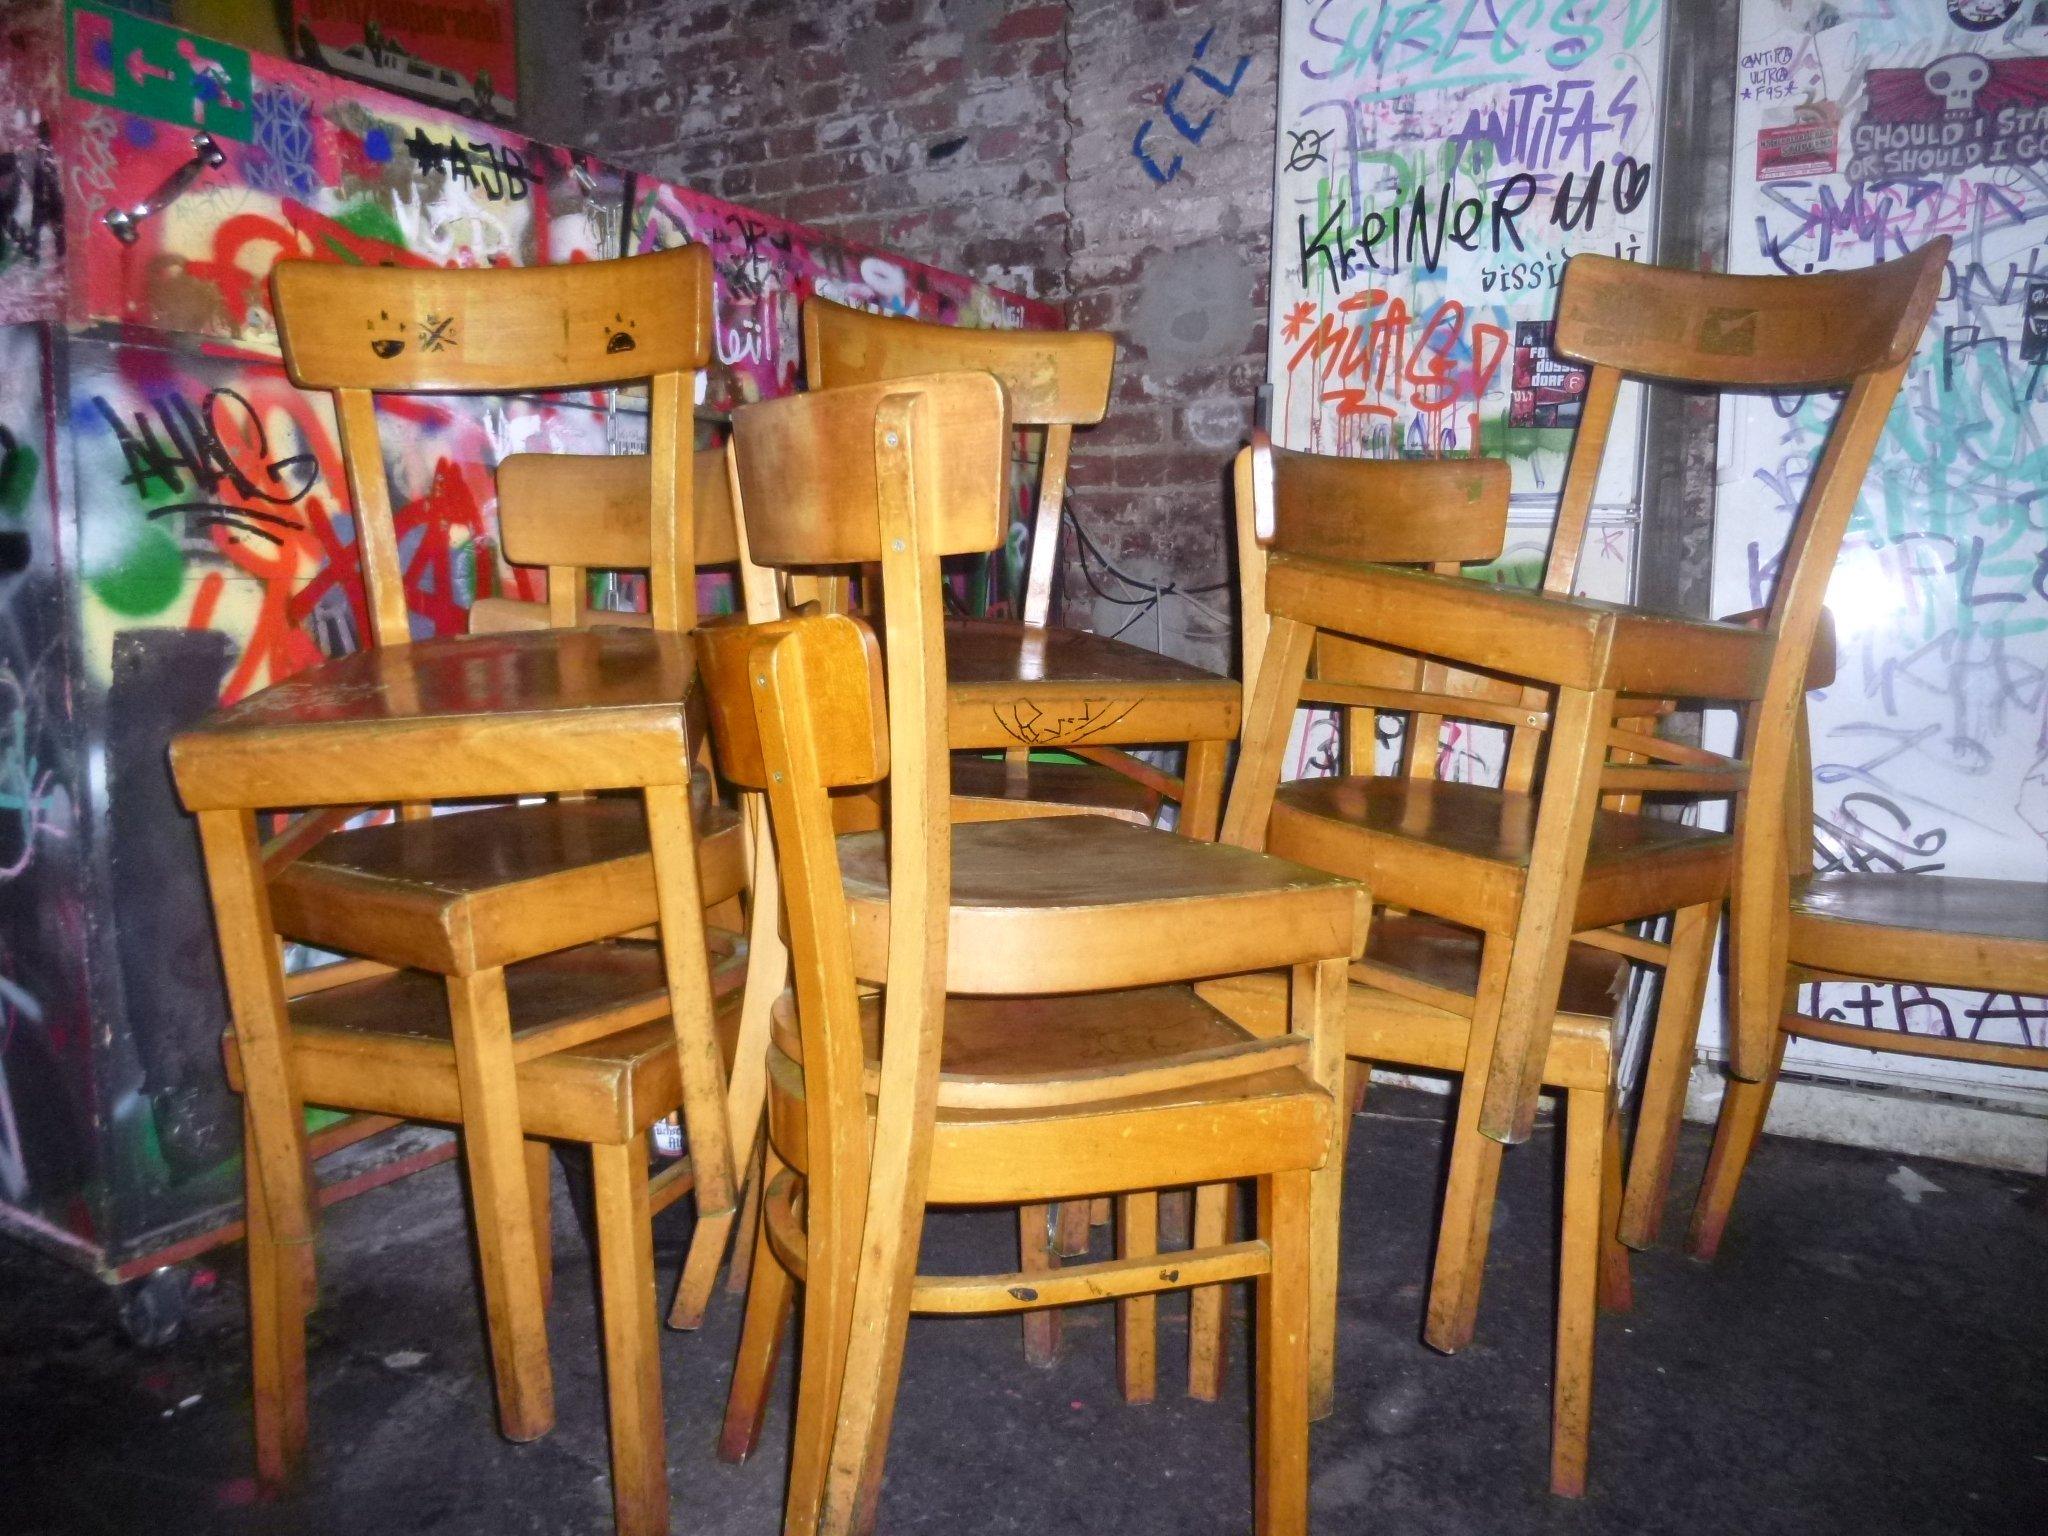 gestappelte Stühle